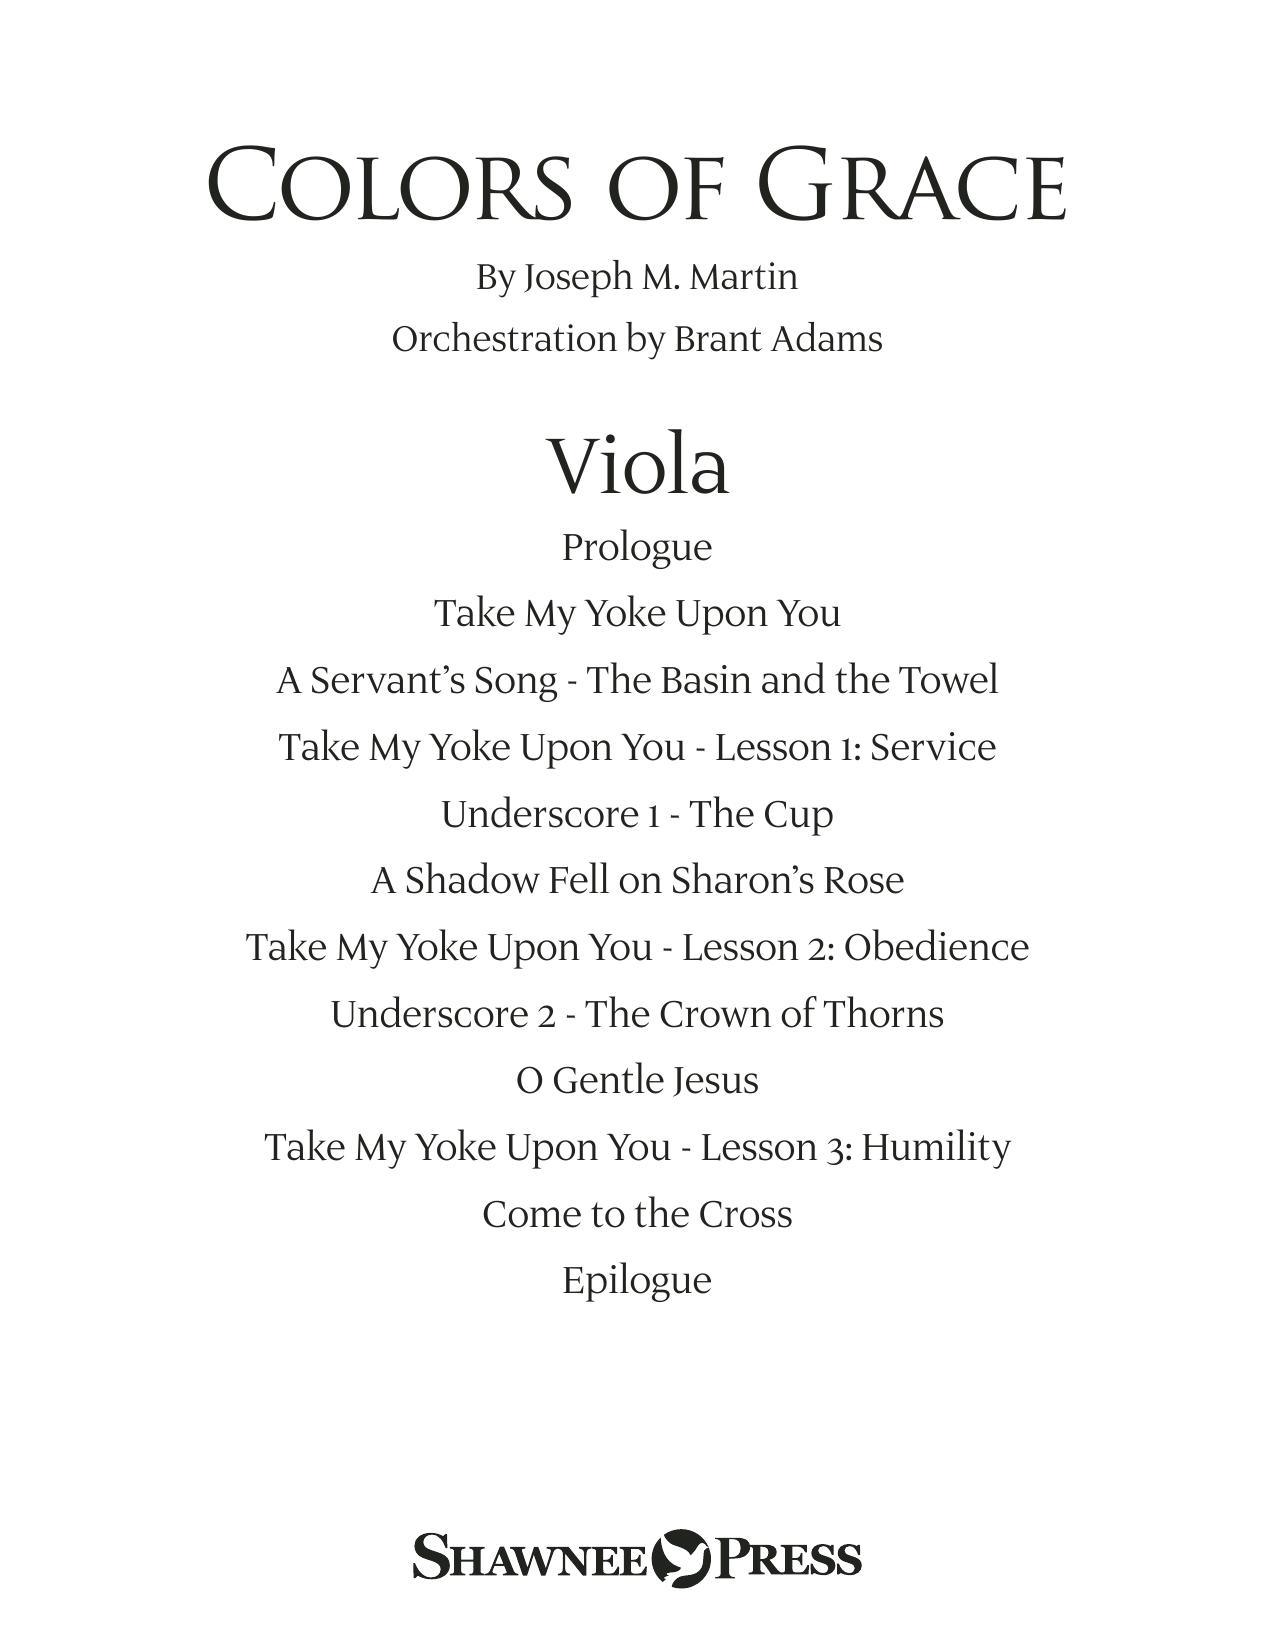 Colors of Grace - Lessons for Lent (New Edition) (Orchestra Accompaniment) - Viola (Choir Instrumental Pak)